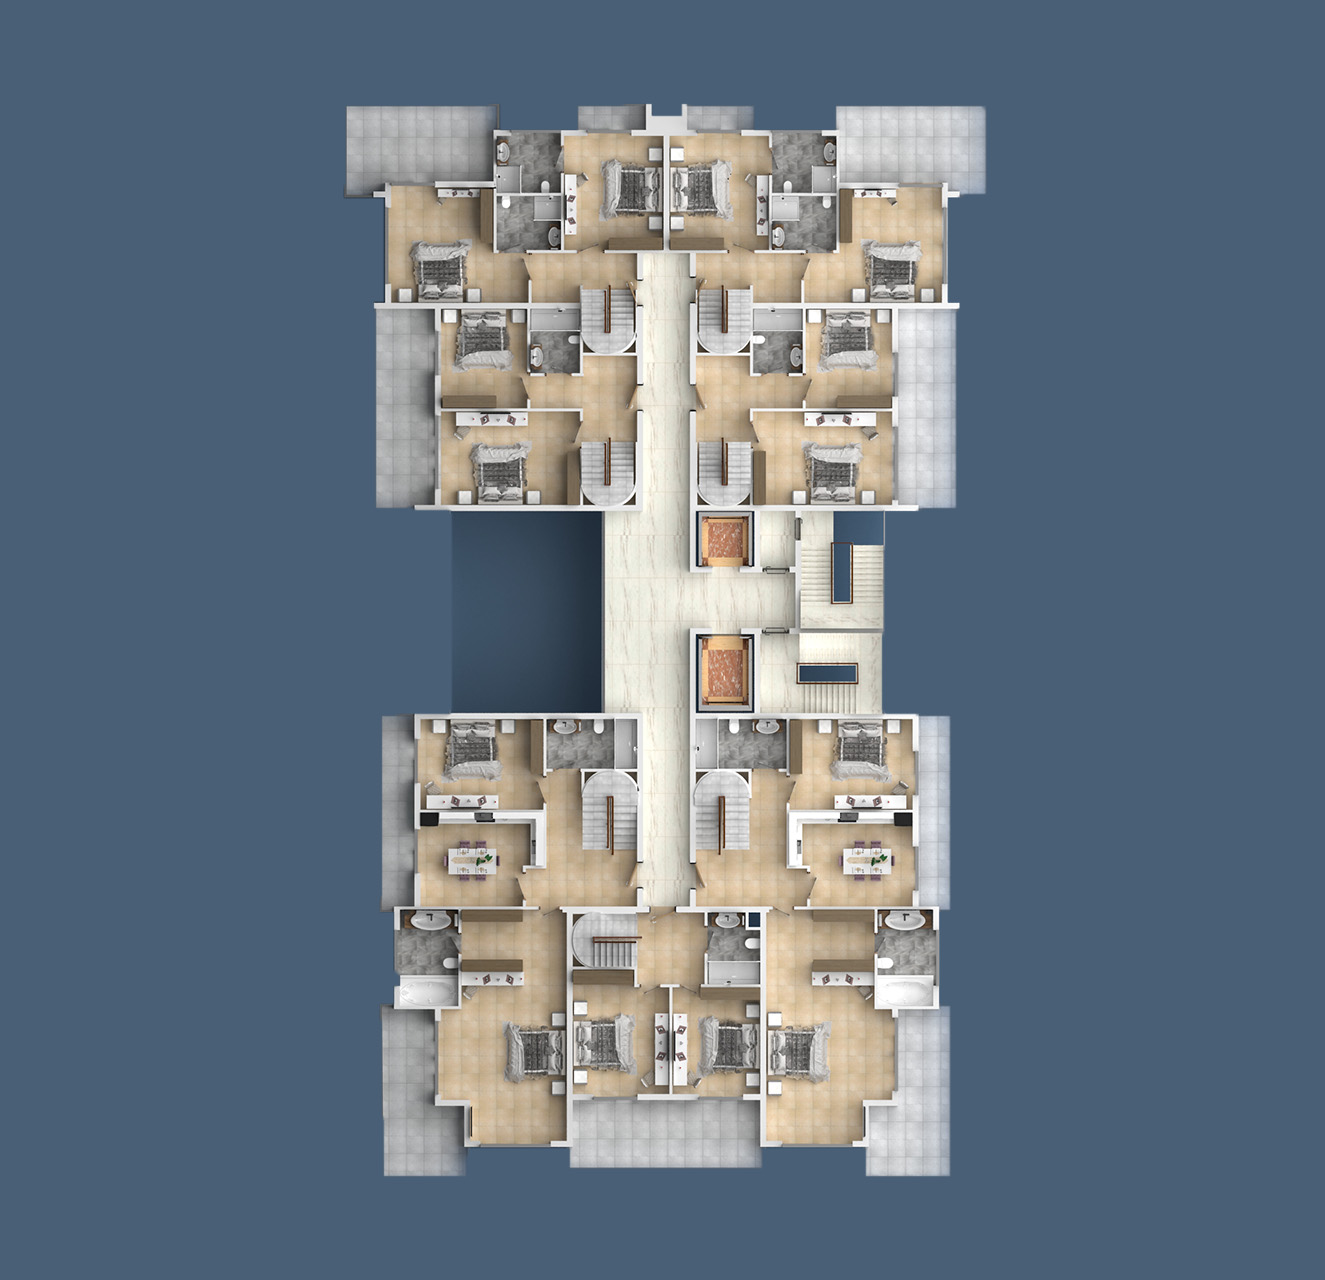 Floor plans of apartments 7 floor «A» Yekta Kingdom Trade Center